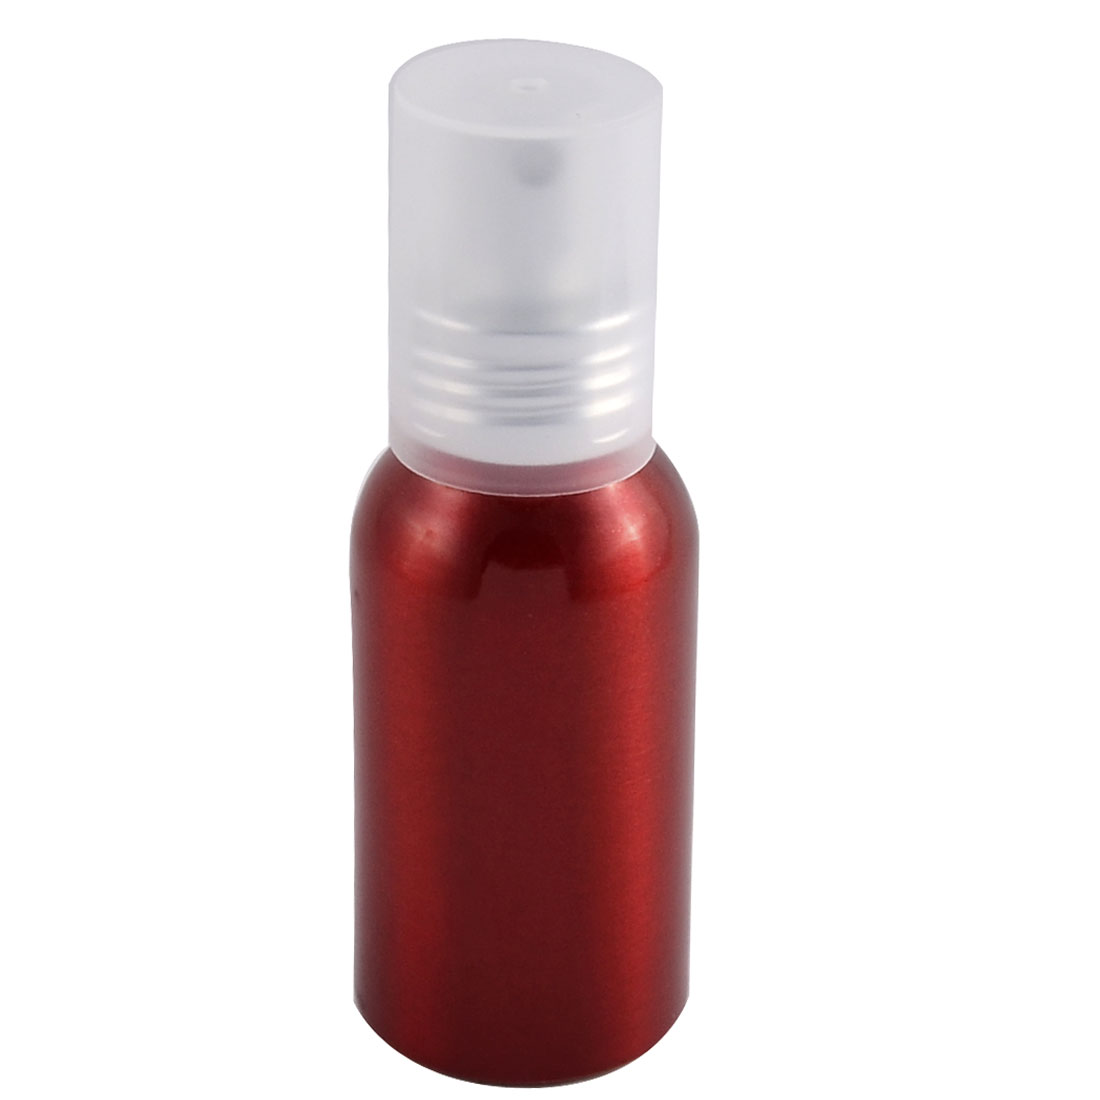 Travel Aluminum Cosmetic Emulsion Press Pump Fine Mist Spray Bottle Burgundy 100ml